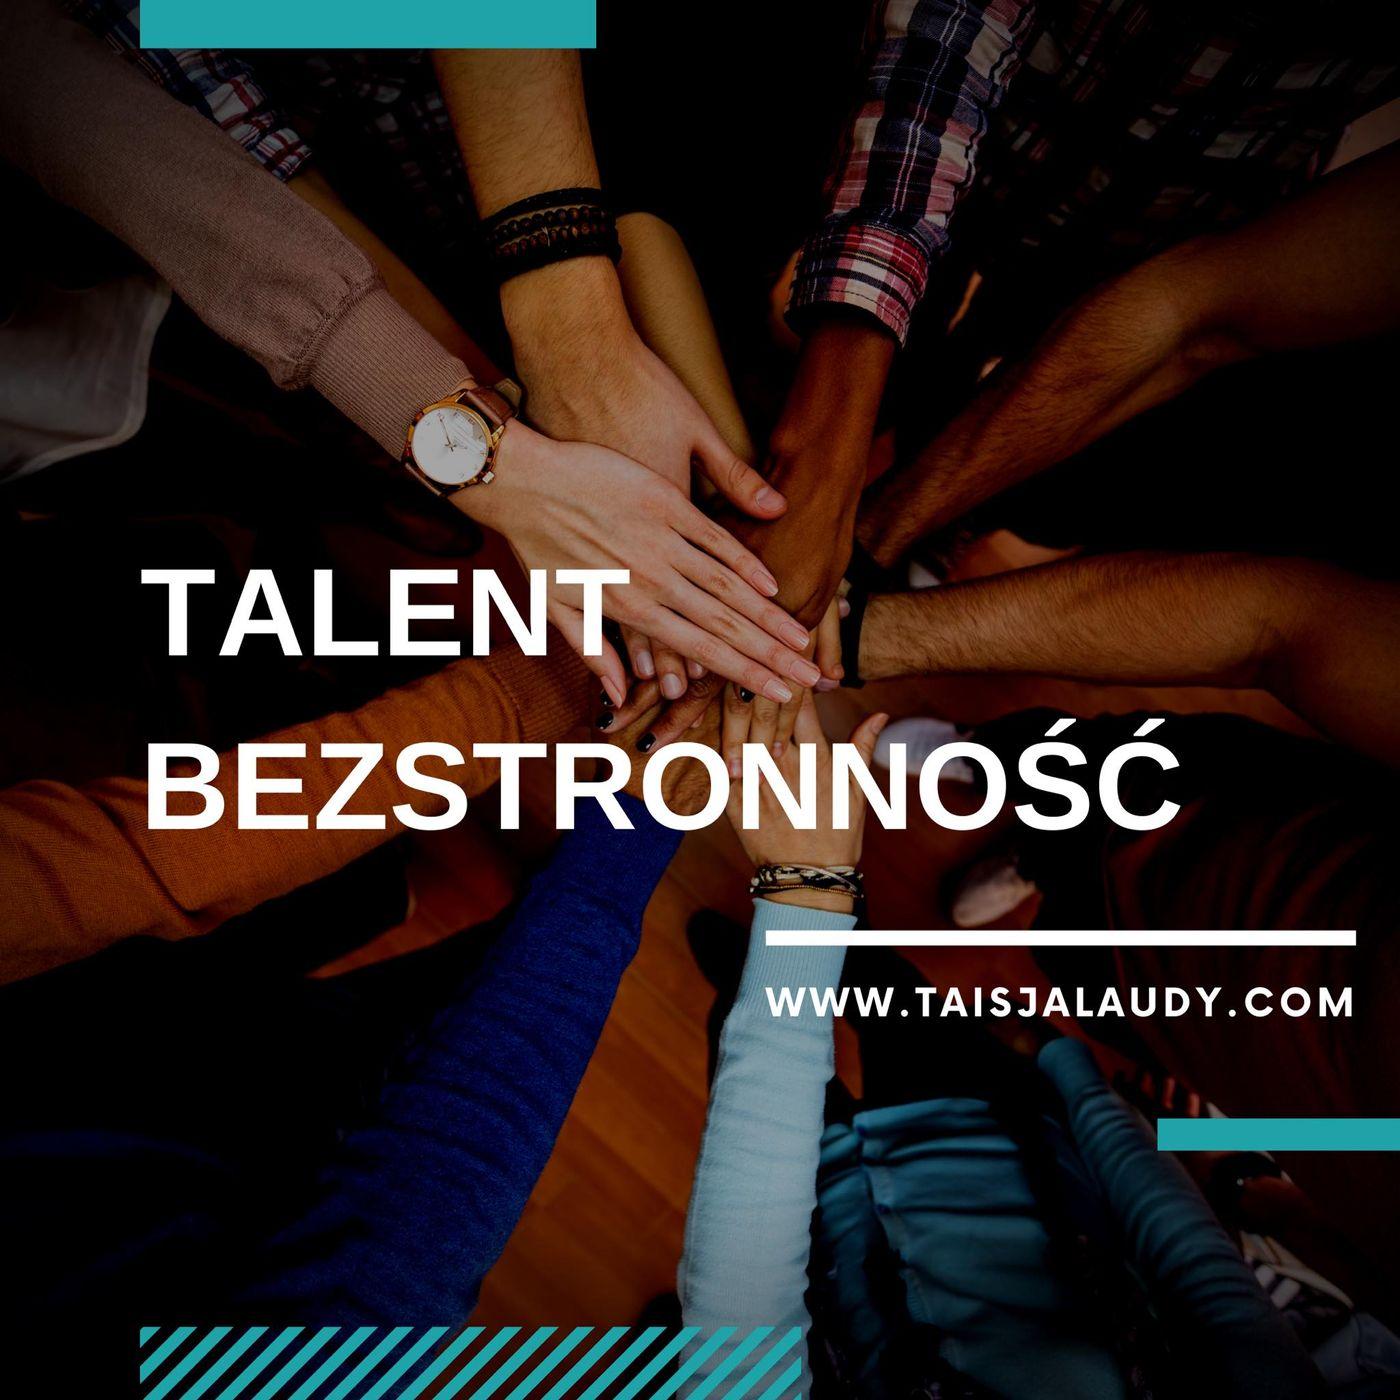 Talent Bezstronność (Consistency) - Test GALLUPa, Clifton StrengthsFinder 2.0